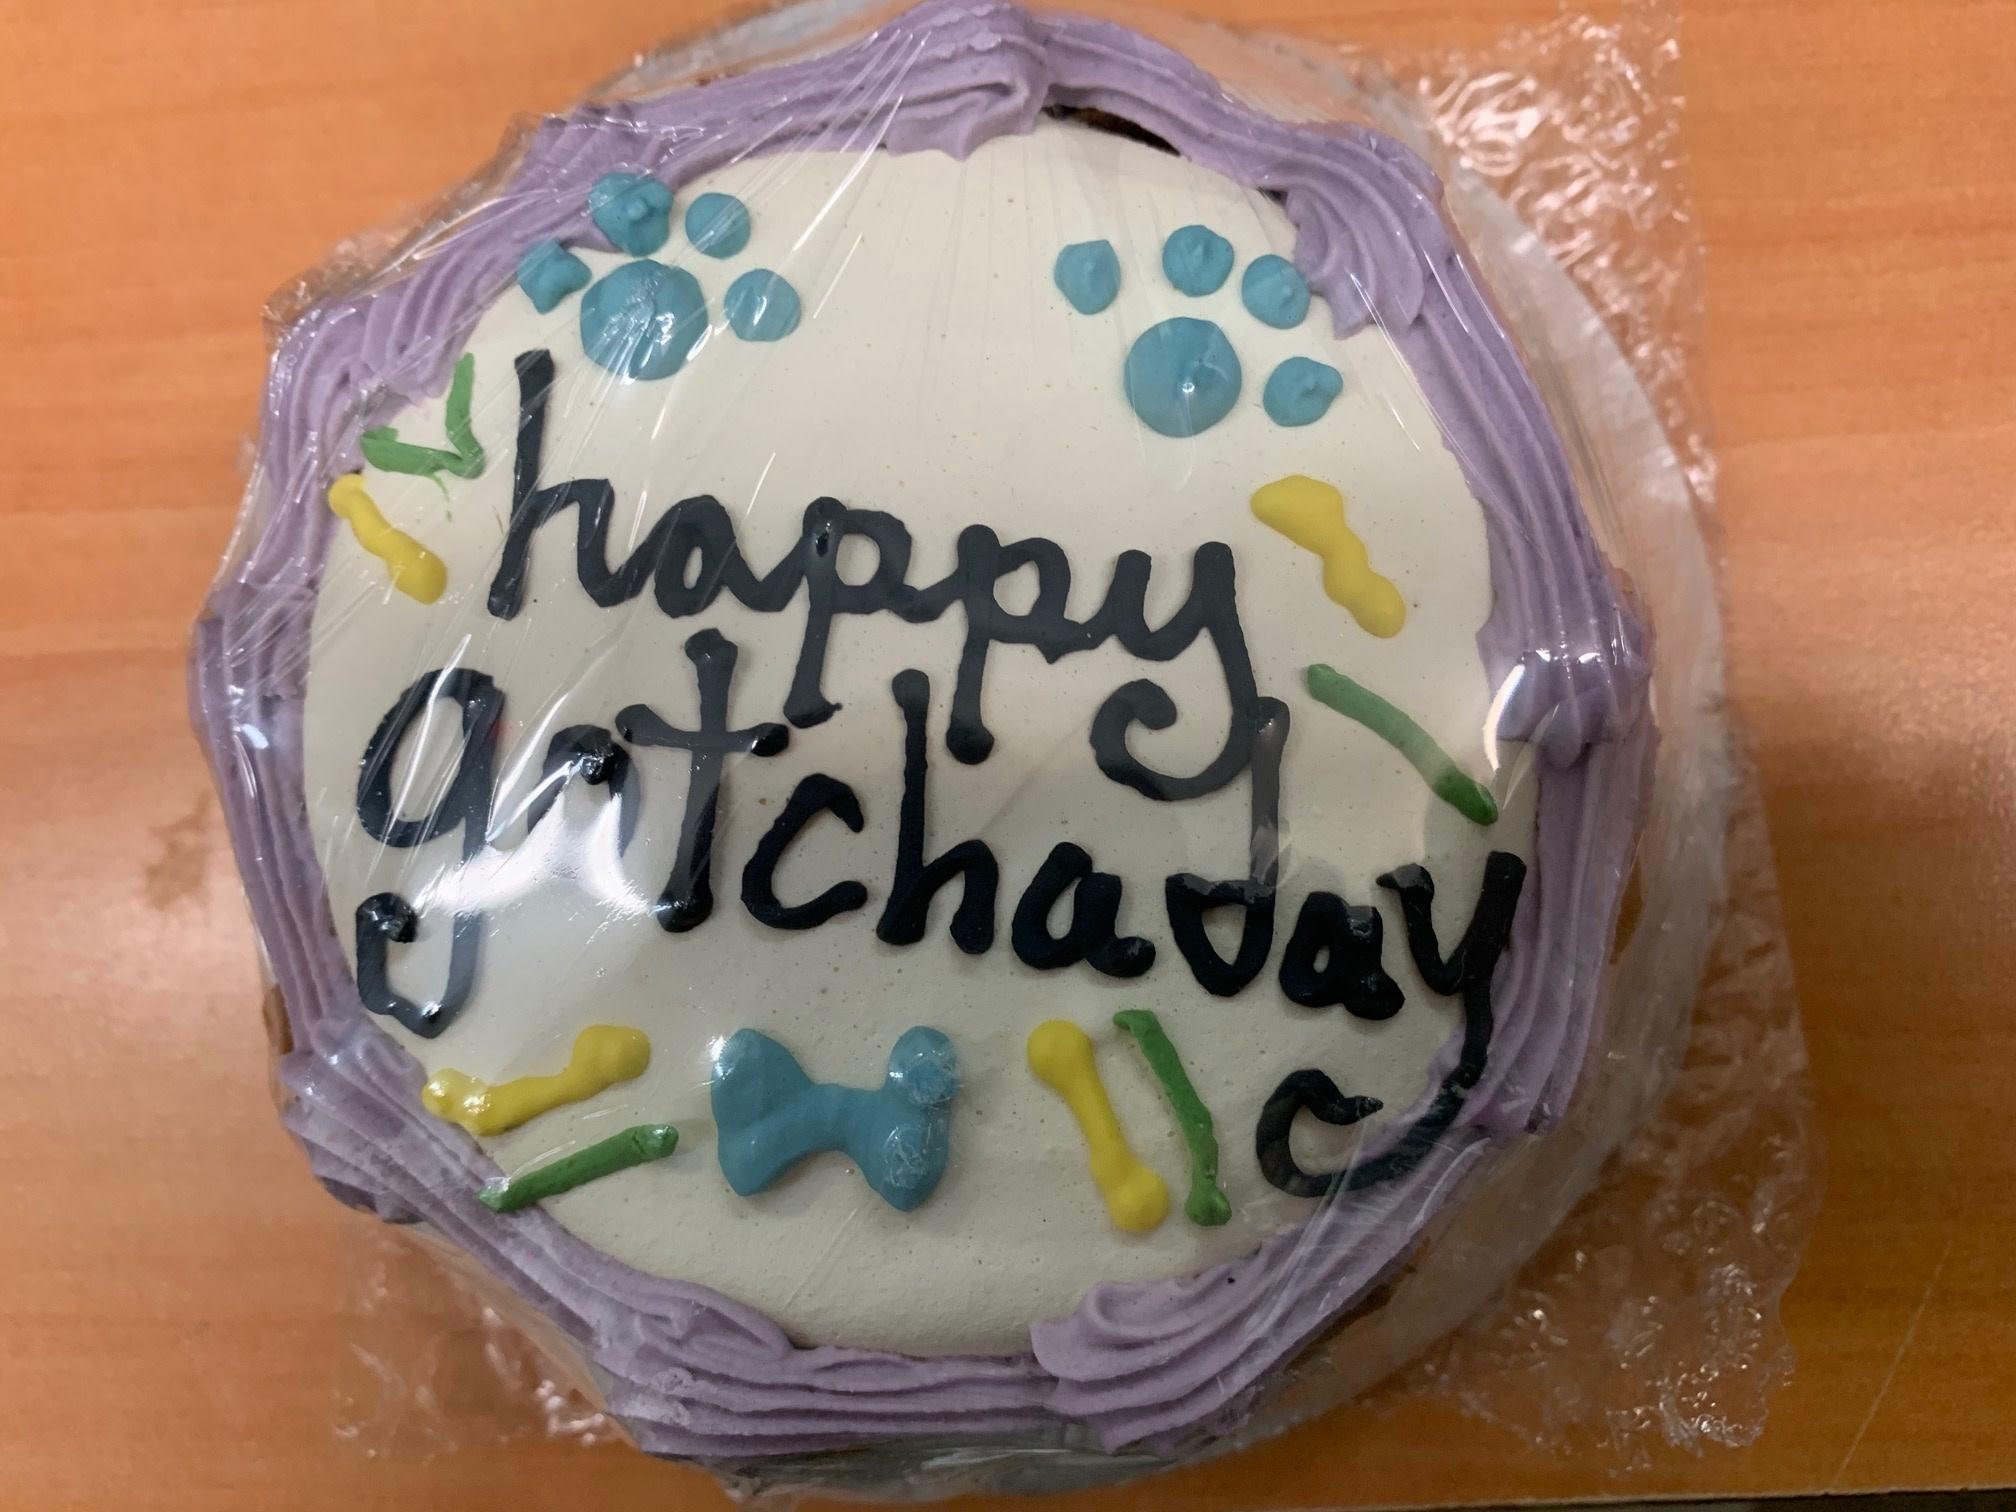 Happy Gotcha Day Cake - Shelf Stable